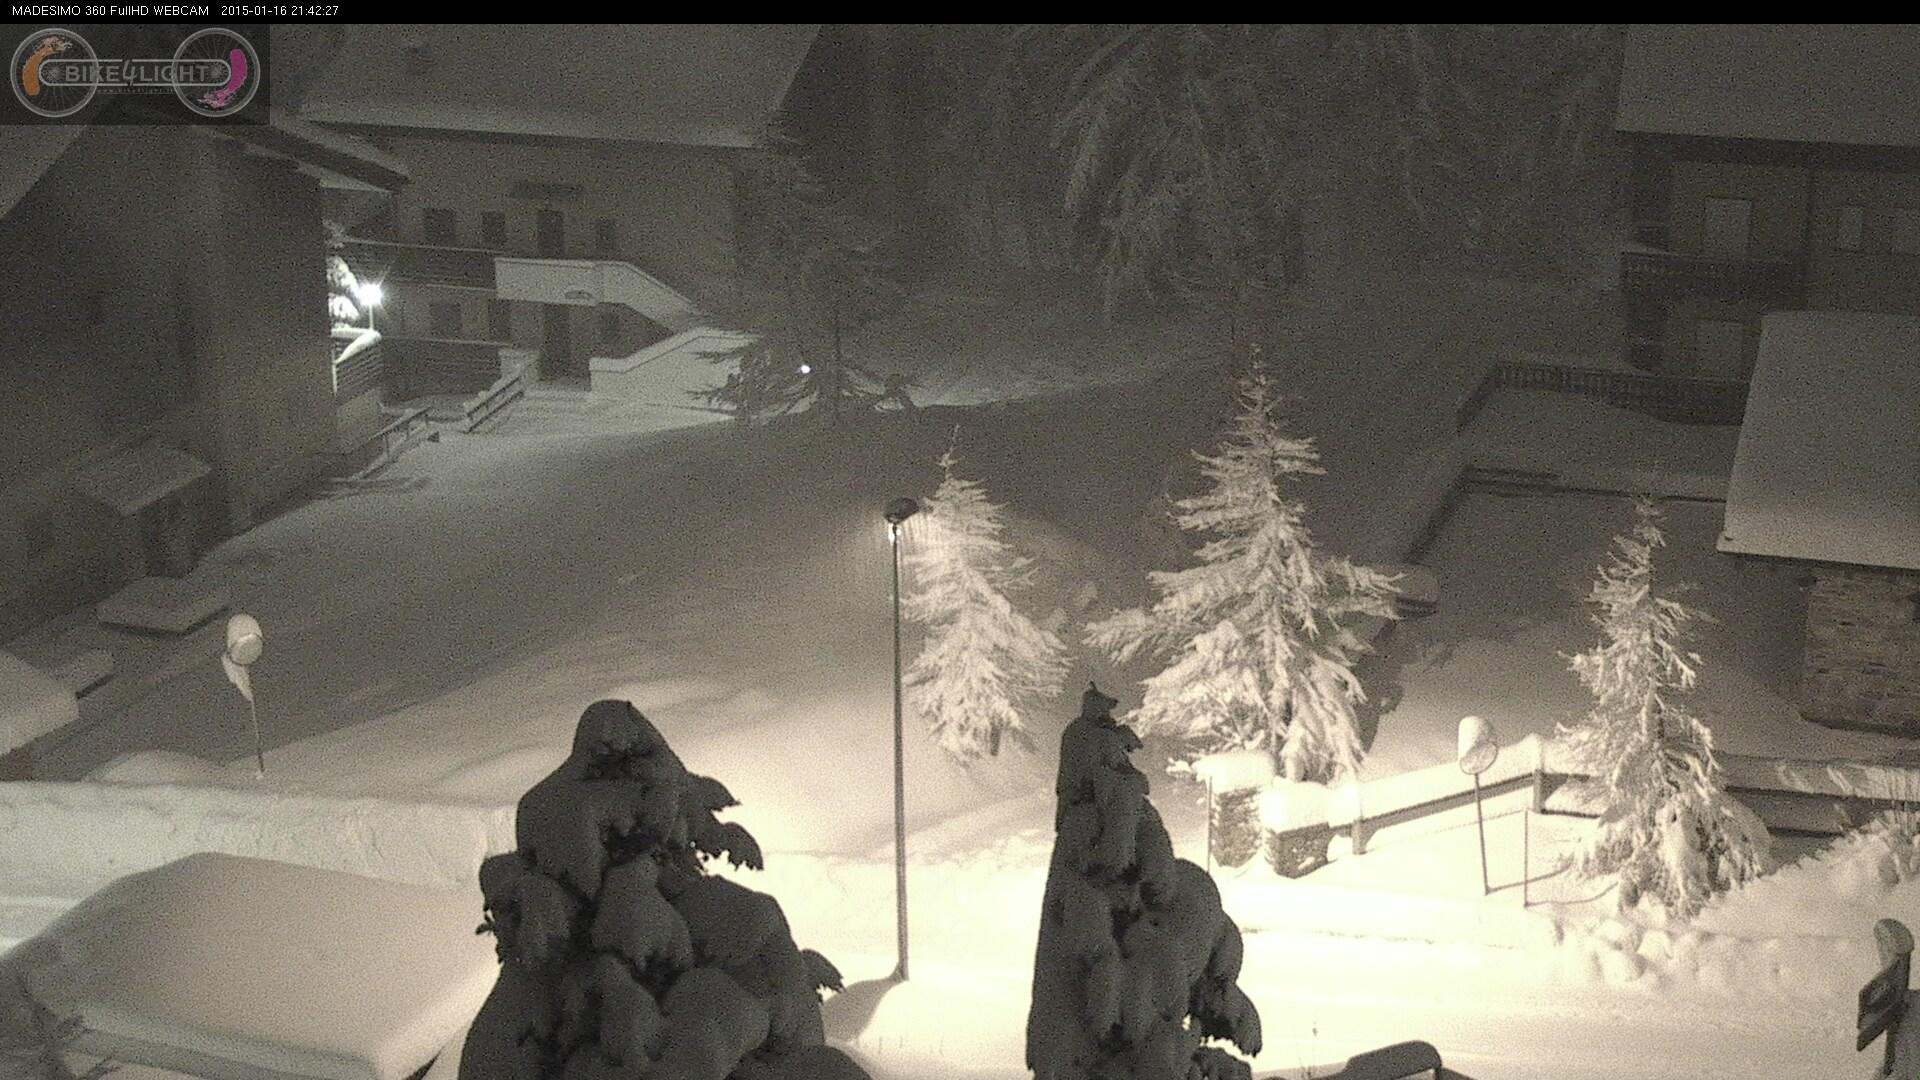 Bufera di neve a Madesimo, guardate quanta!